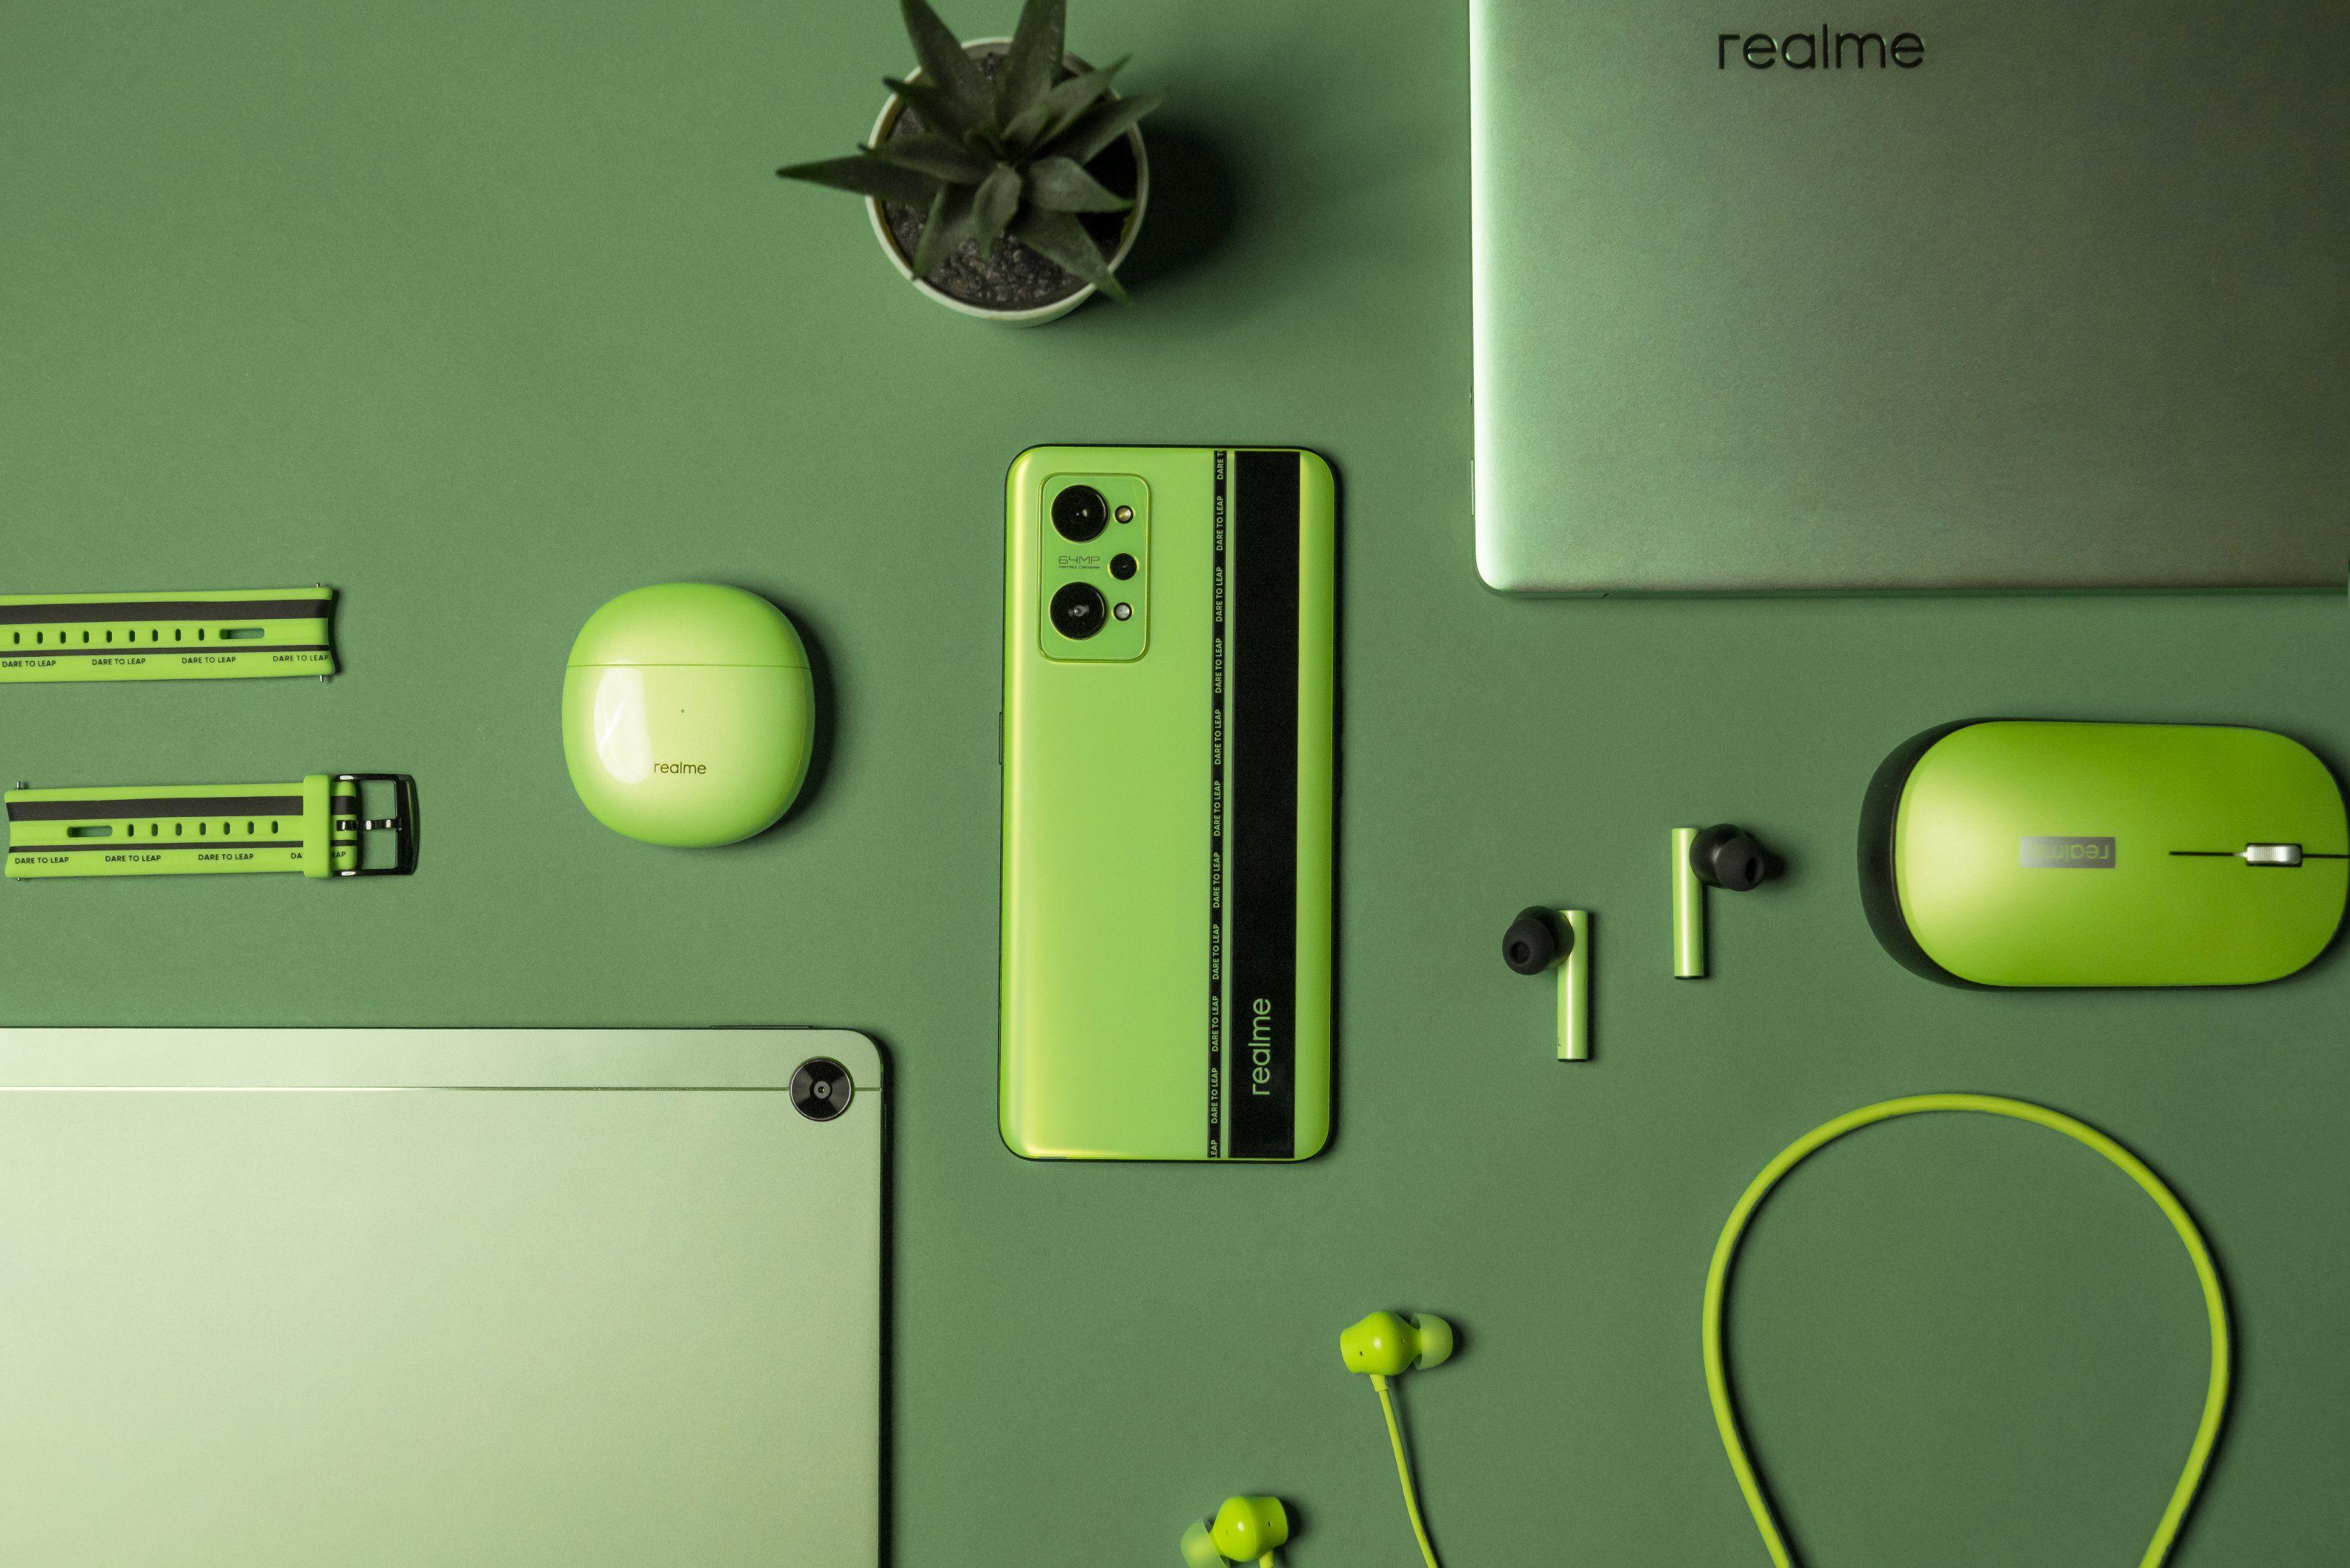 Realme Pad、Realme Book Green Color 选项即将推出:这是您需要知道的